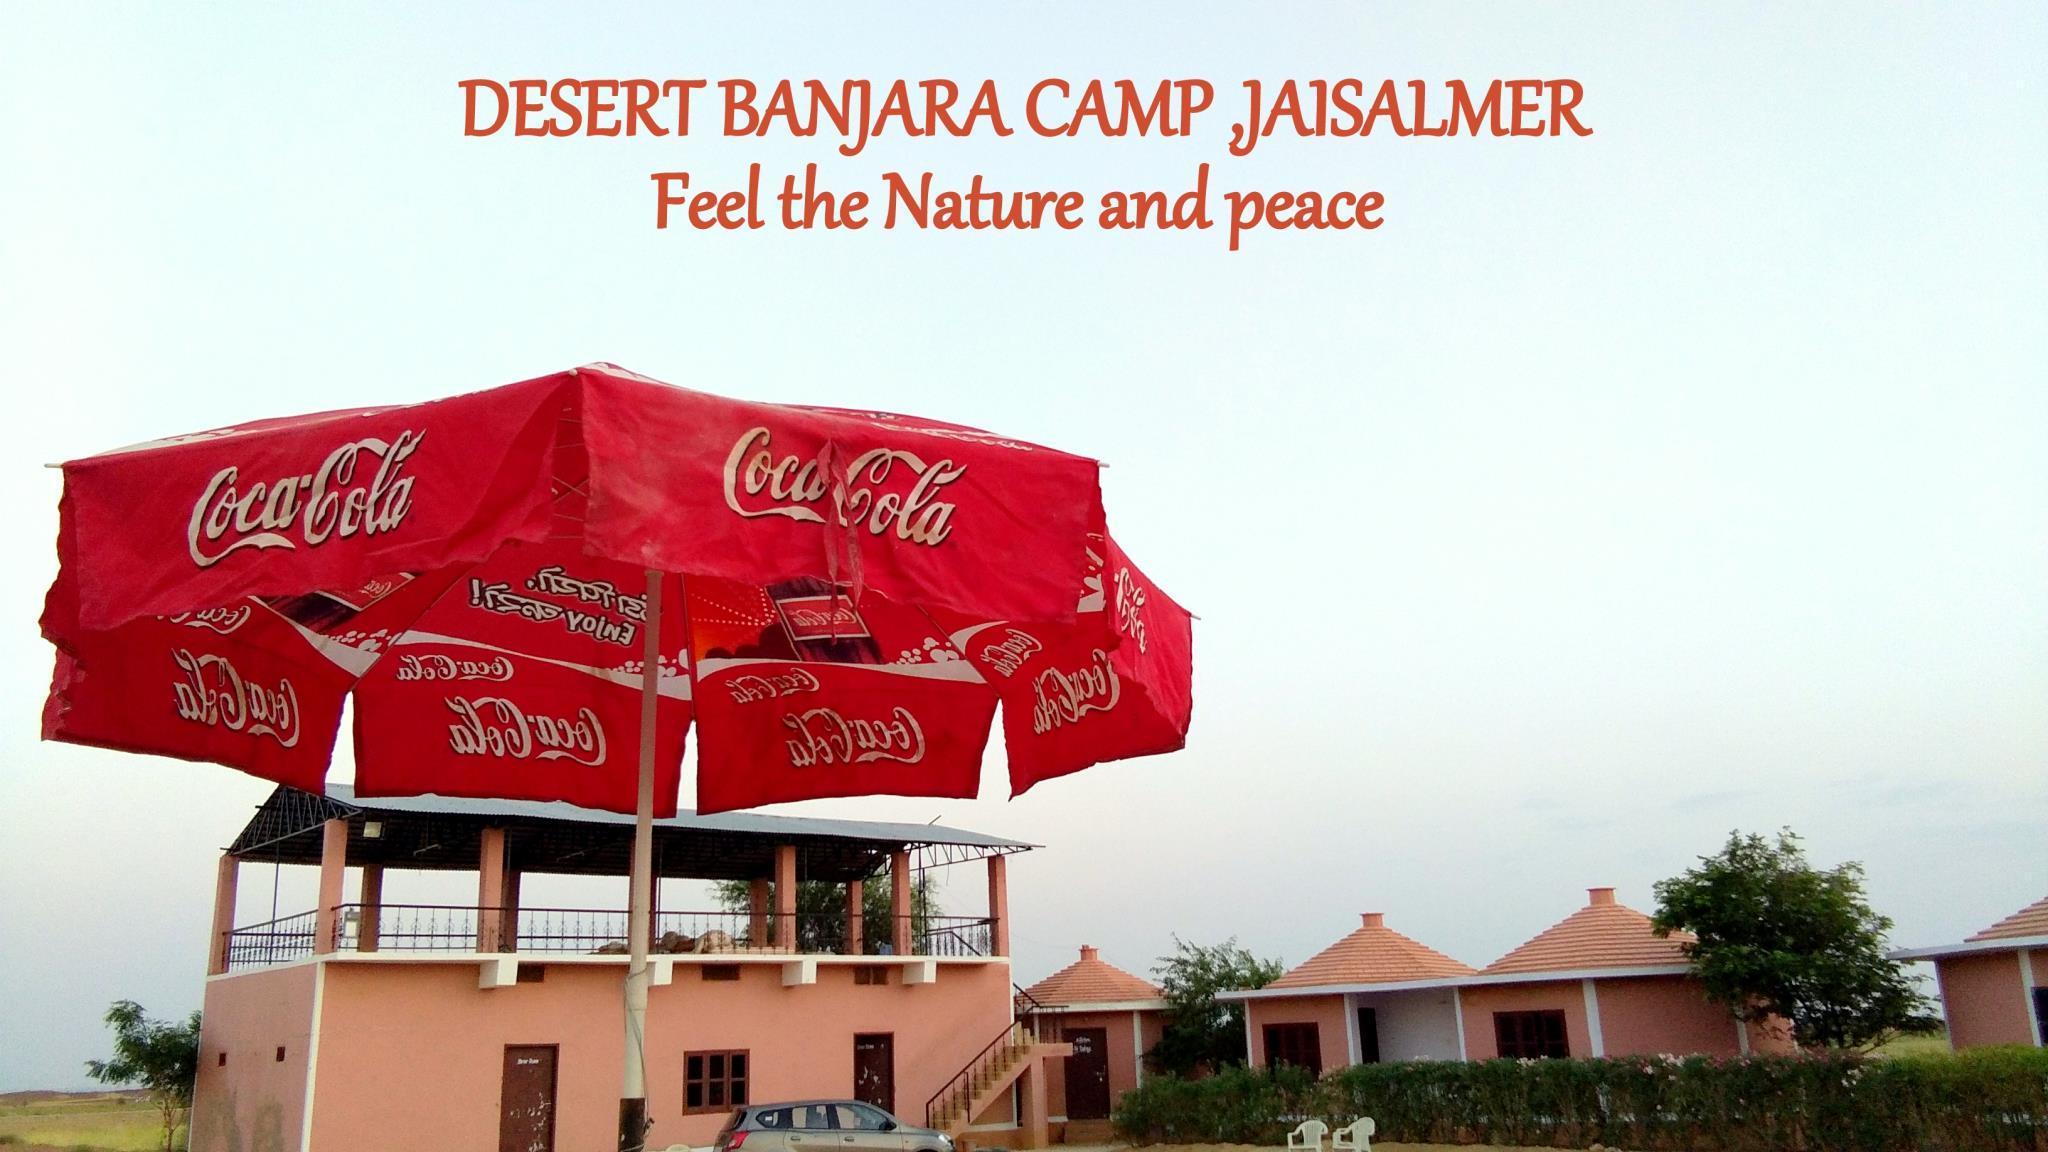 Desert Banjara Camp